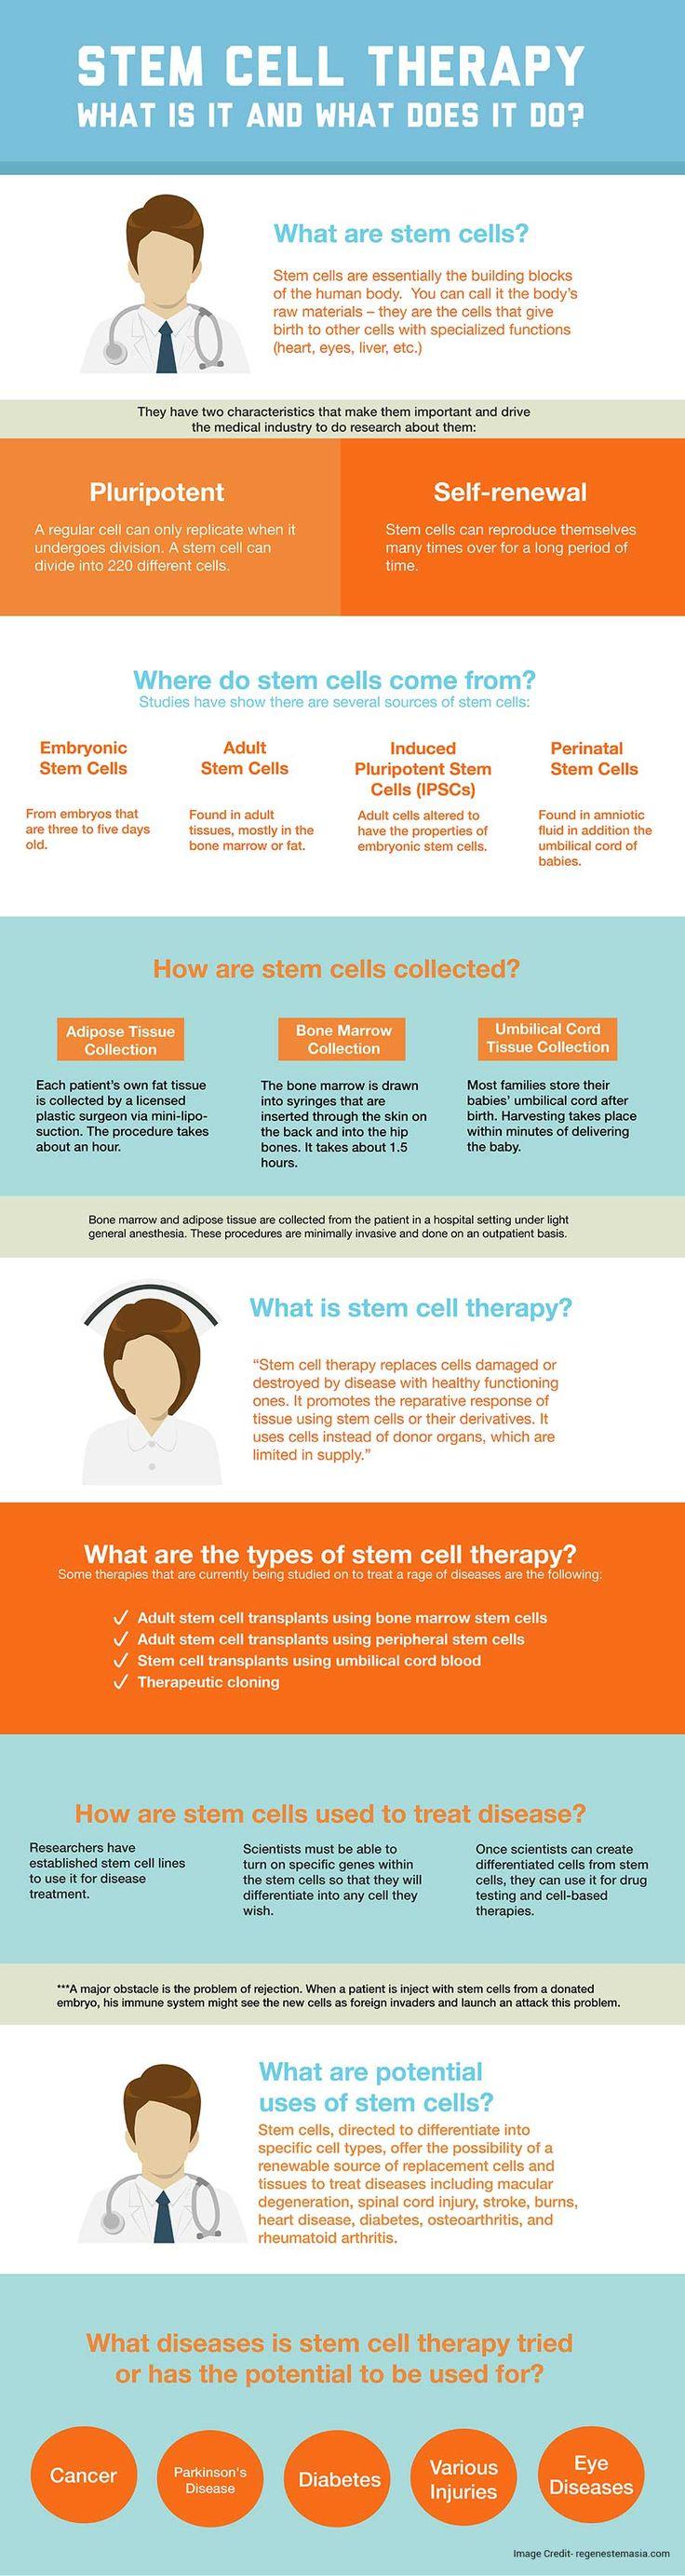 8 Best Stem Cells Images On Pinterest Stem Cells Stems And Trunks